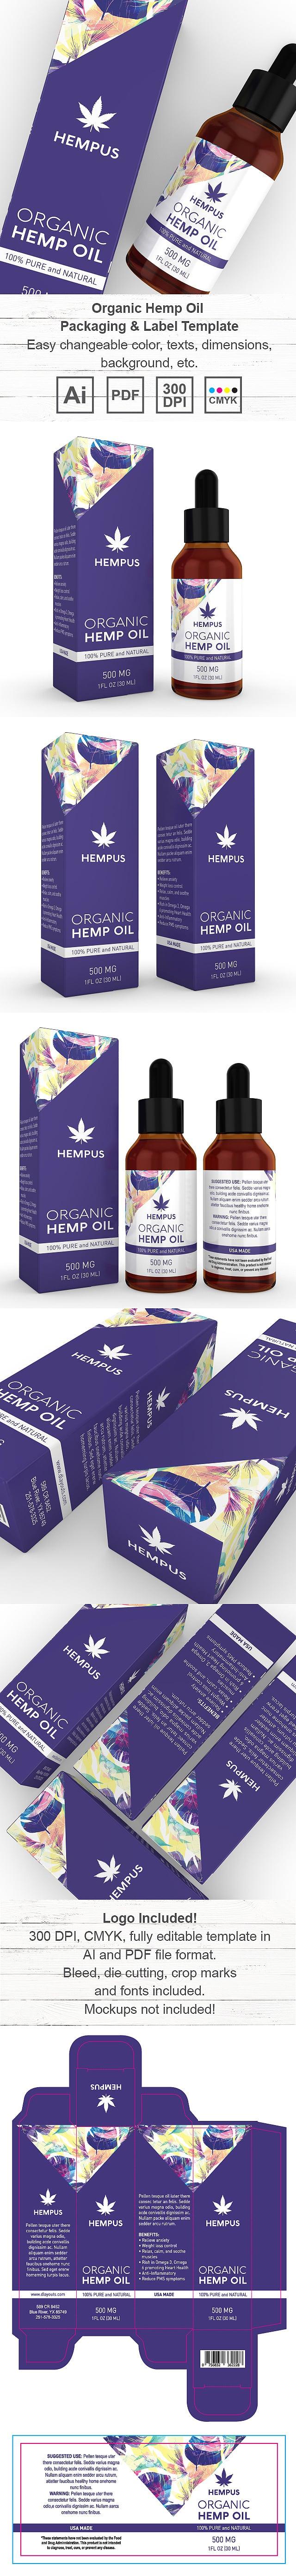 Organic Hemp Oil Drops Packaging & Label Template